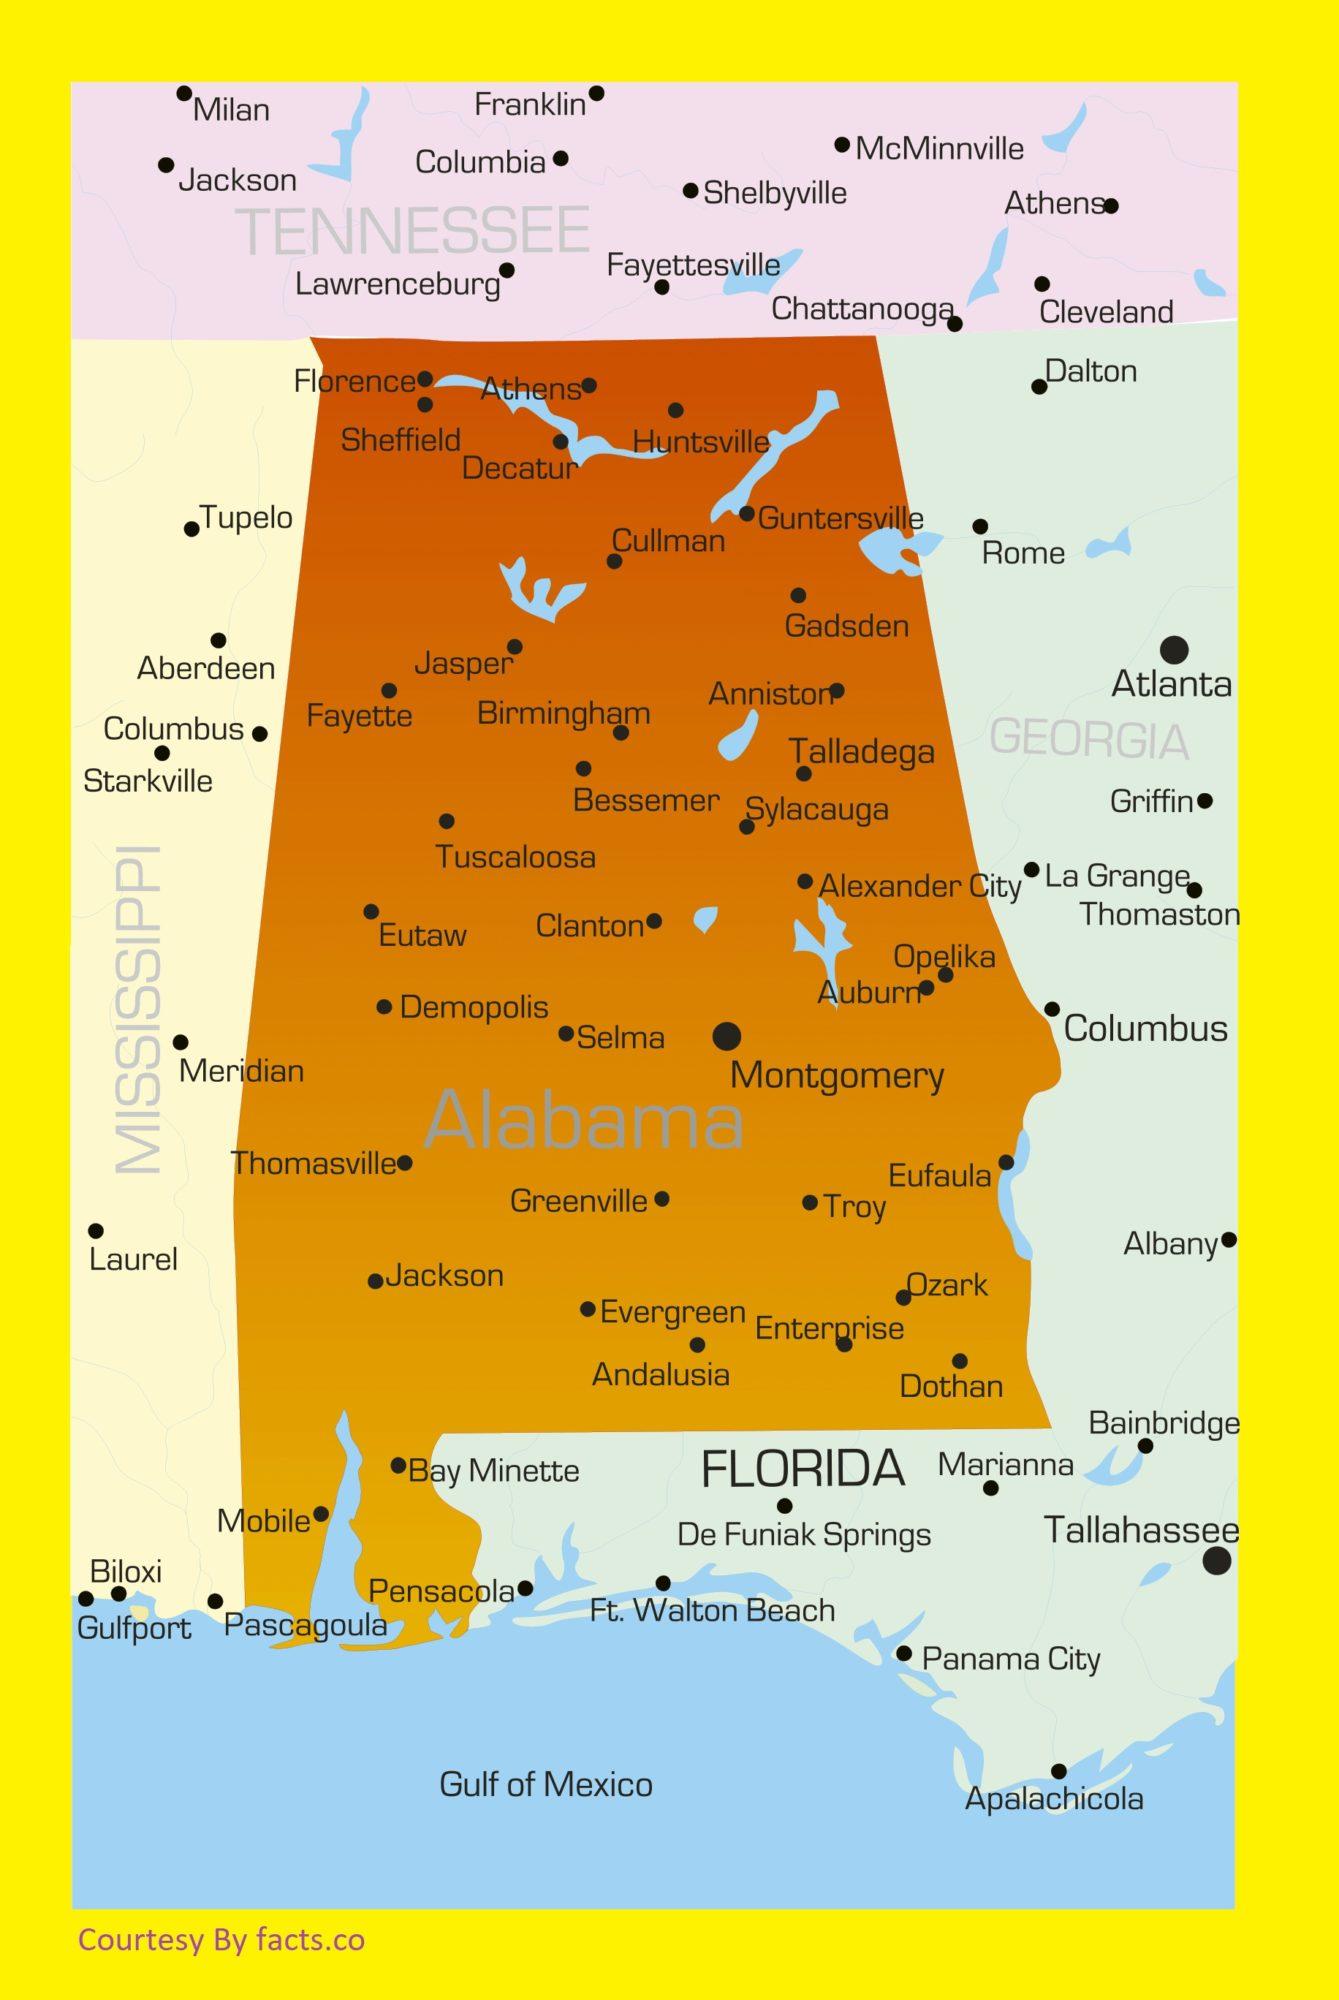 Alabama Large Detailed Label Map | Large Detailed Label Map of Alabama